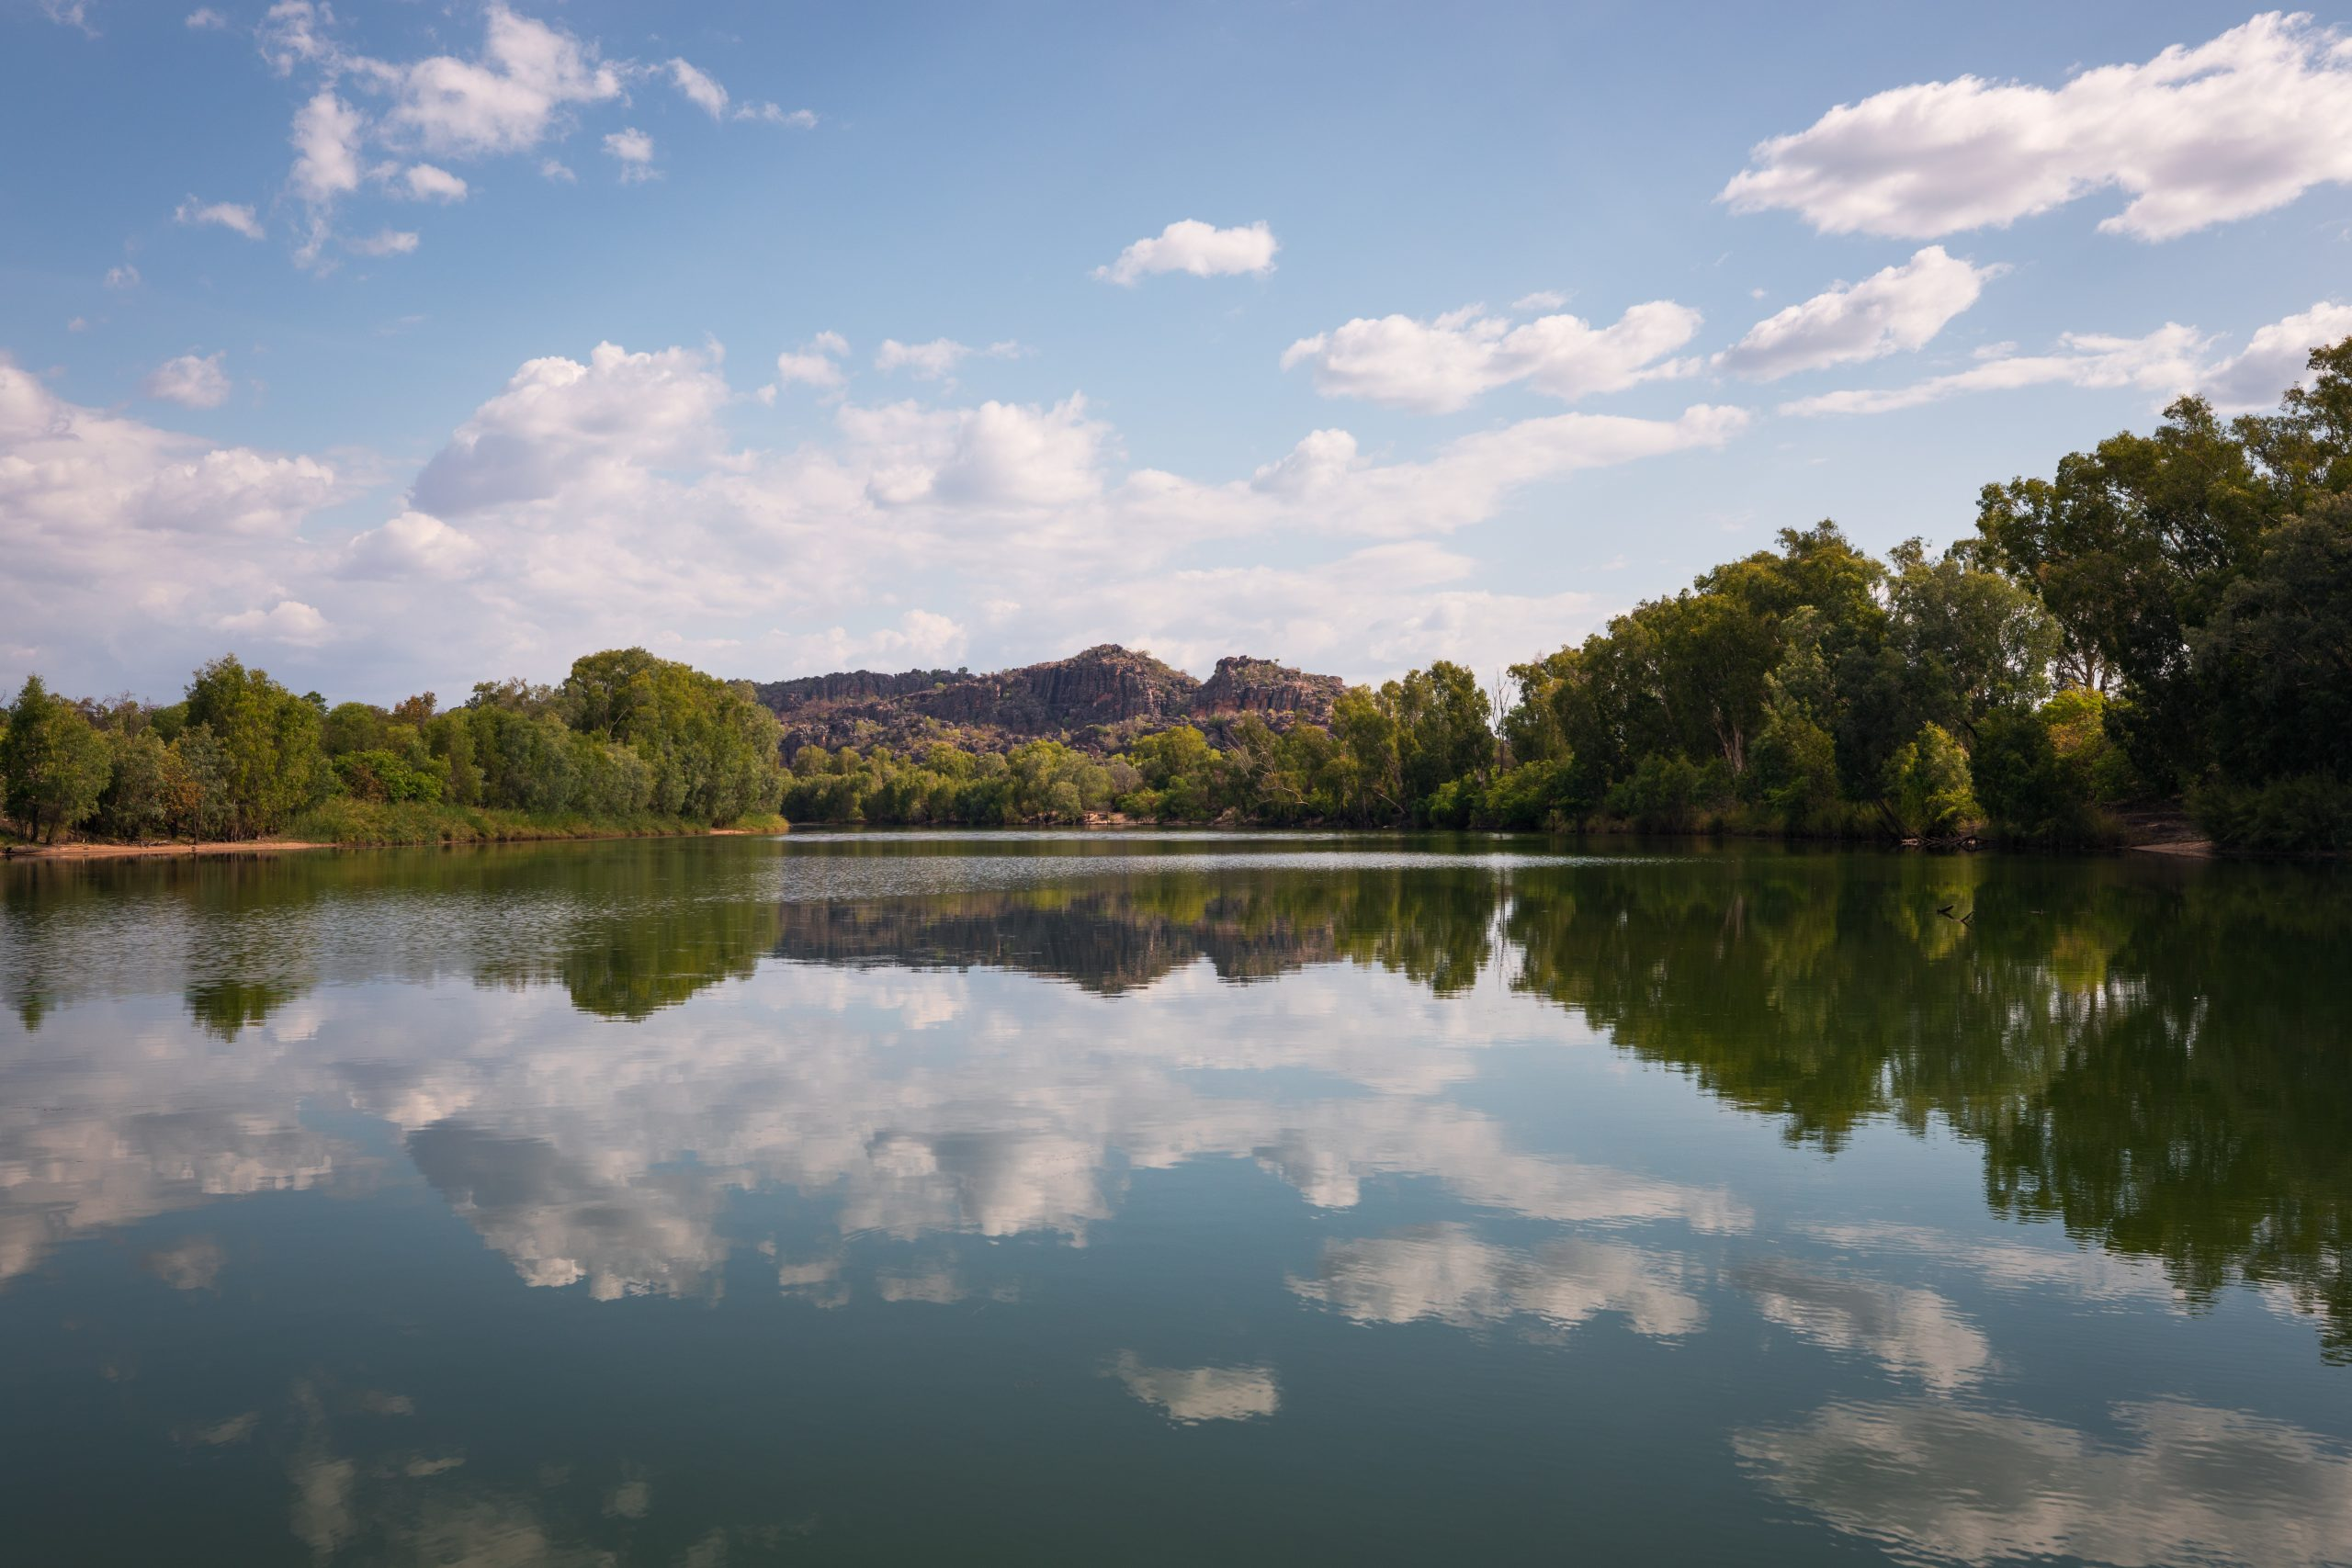 Kakadu, Arnhem Land & Gunlom Falls Adventure | East Alligator River, Kakadu National Park, Northern Territory